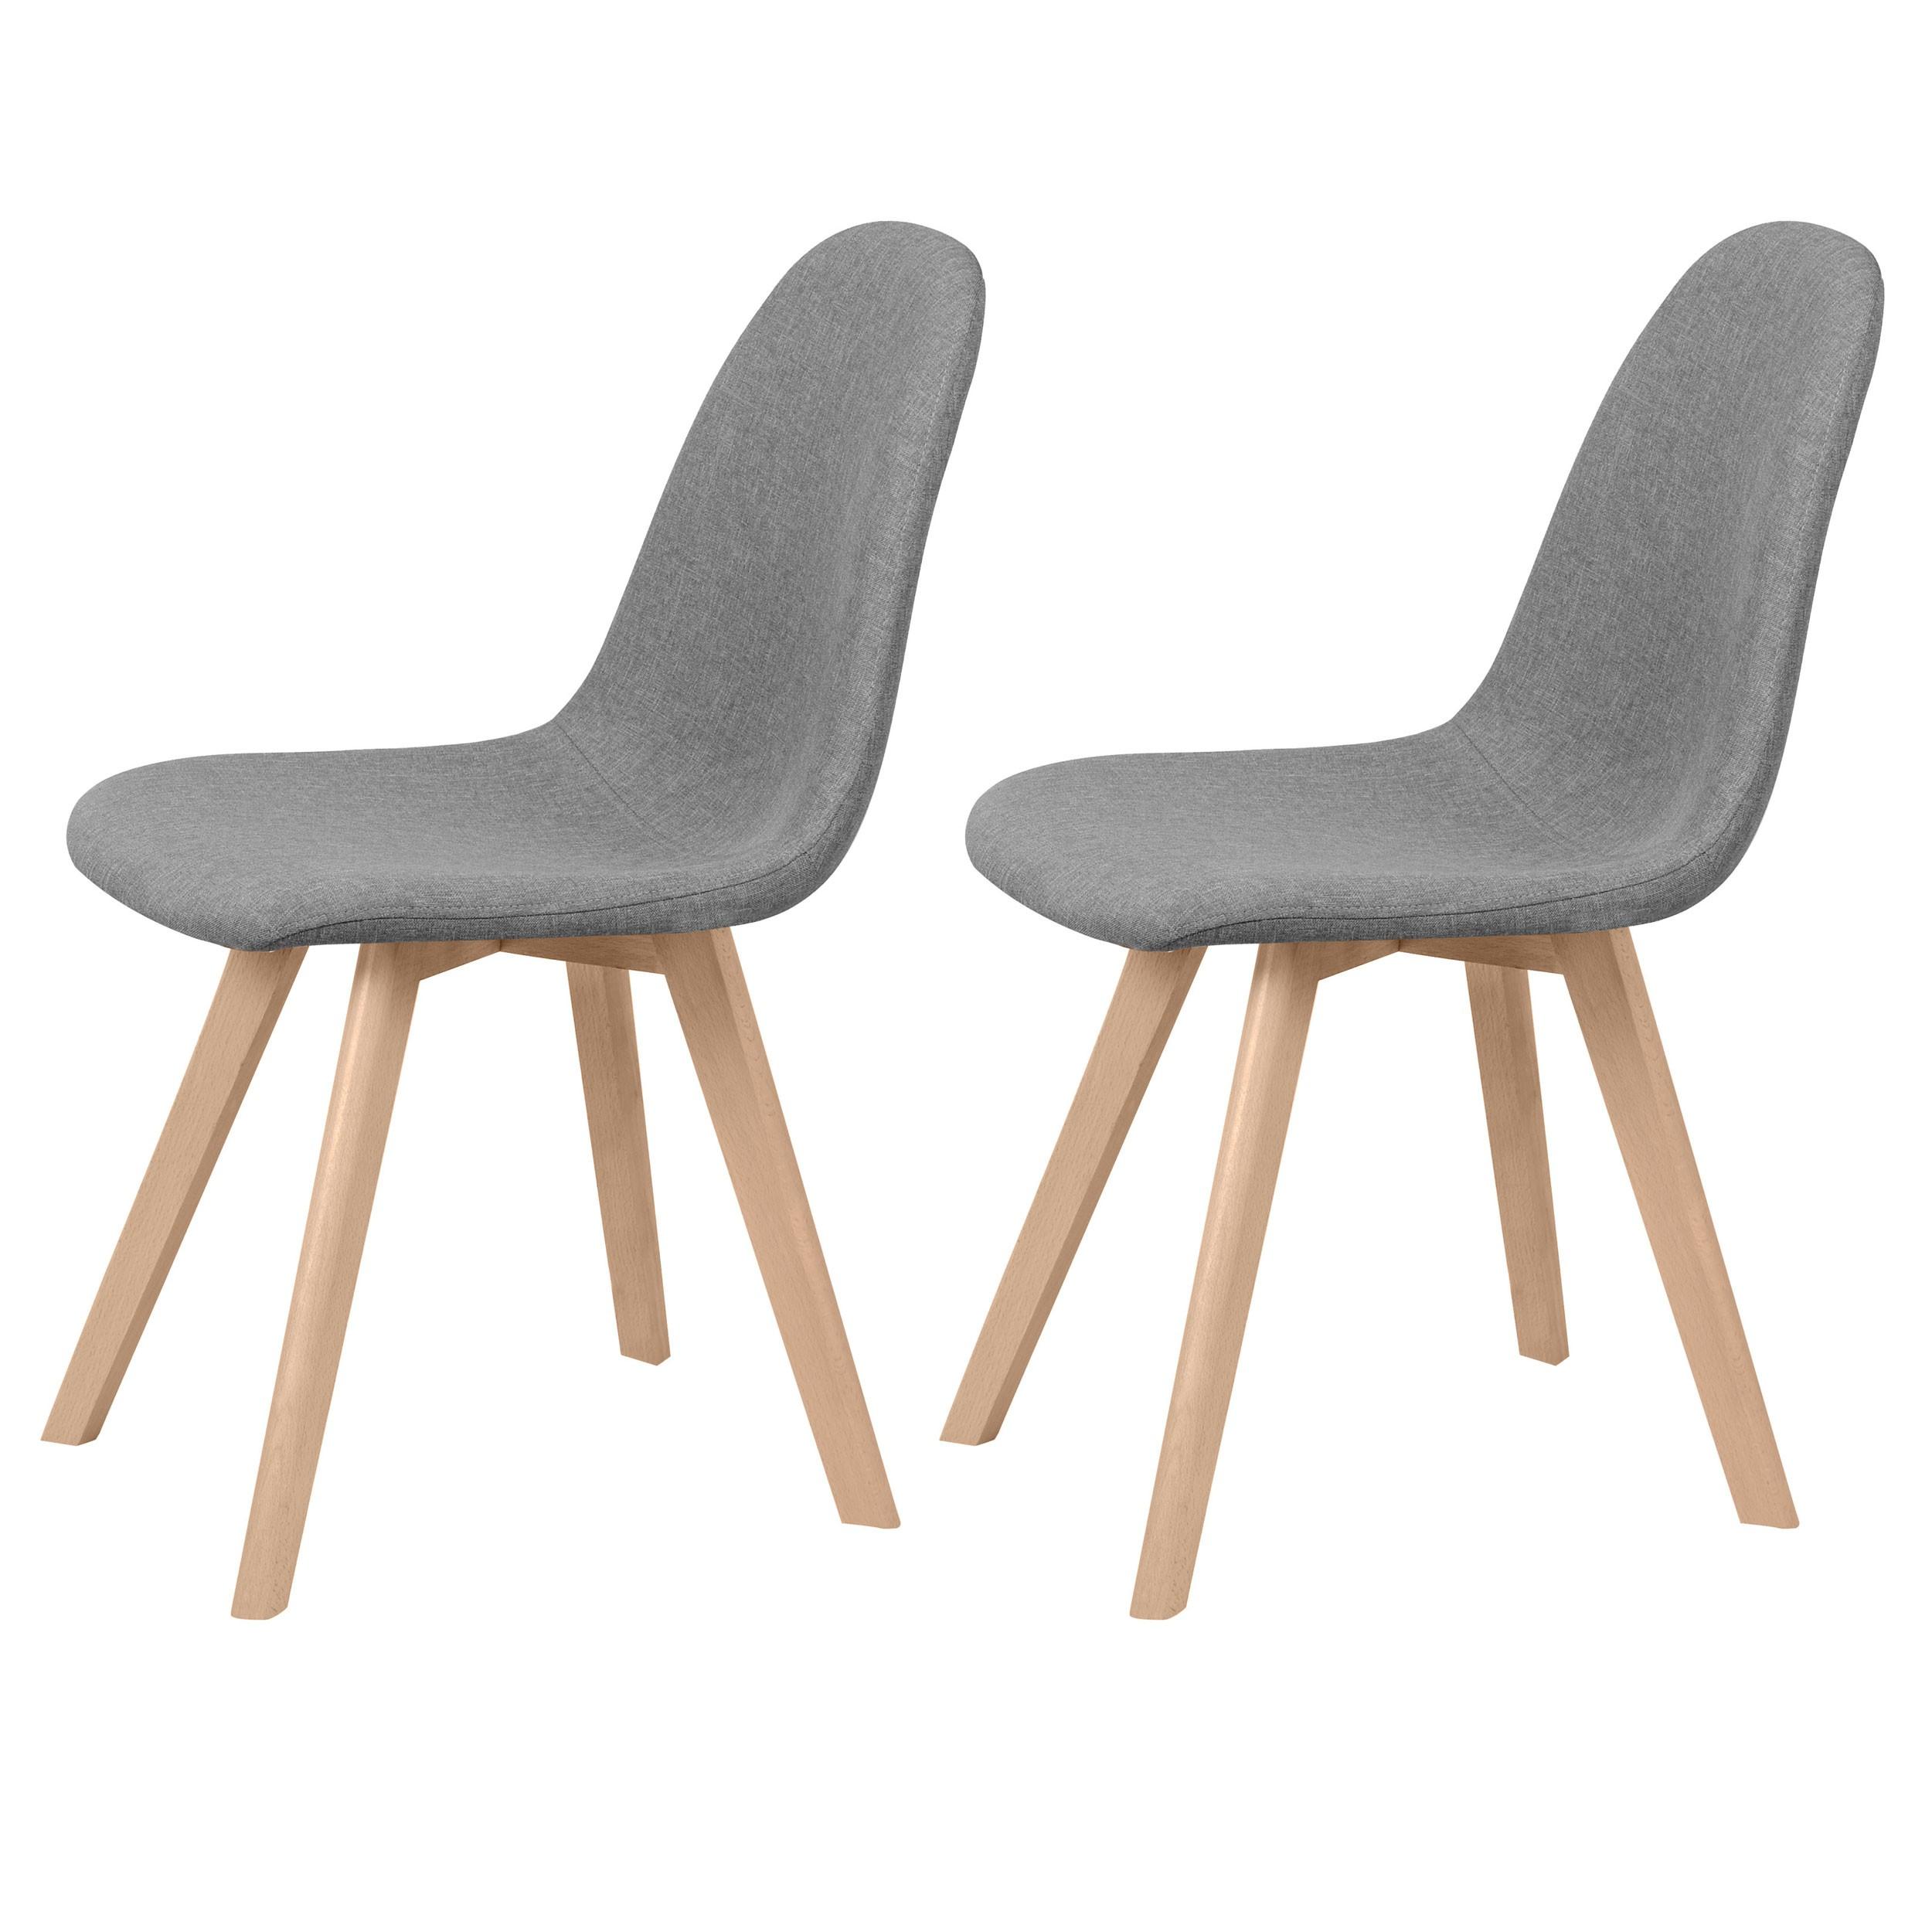 acheter chaises grises scandinaves - Chaises Scandinaves Grises